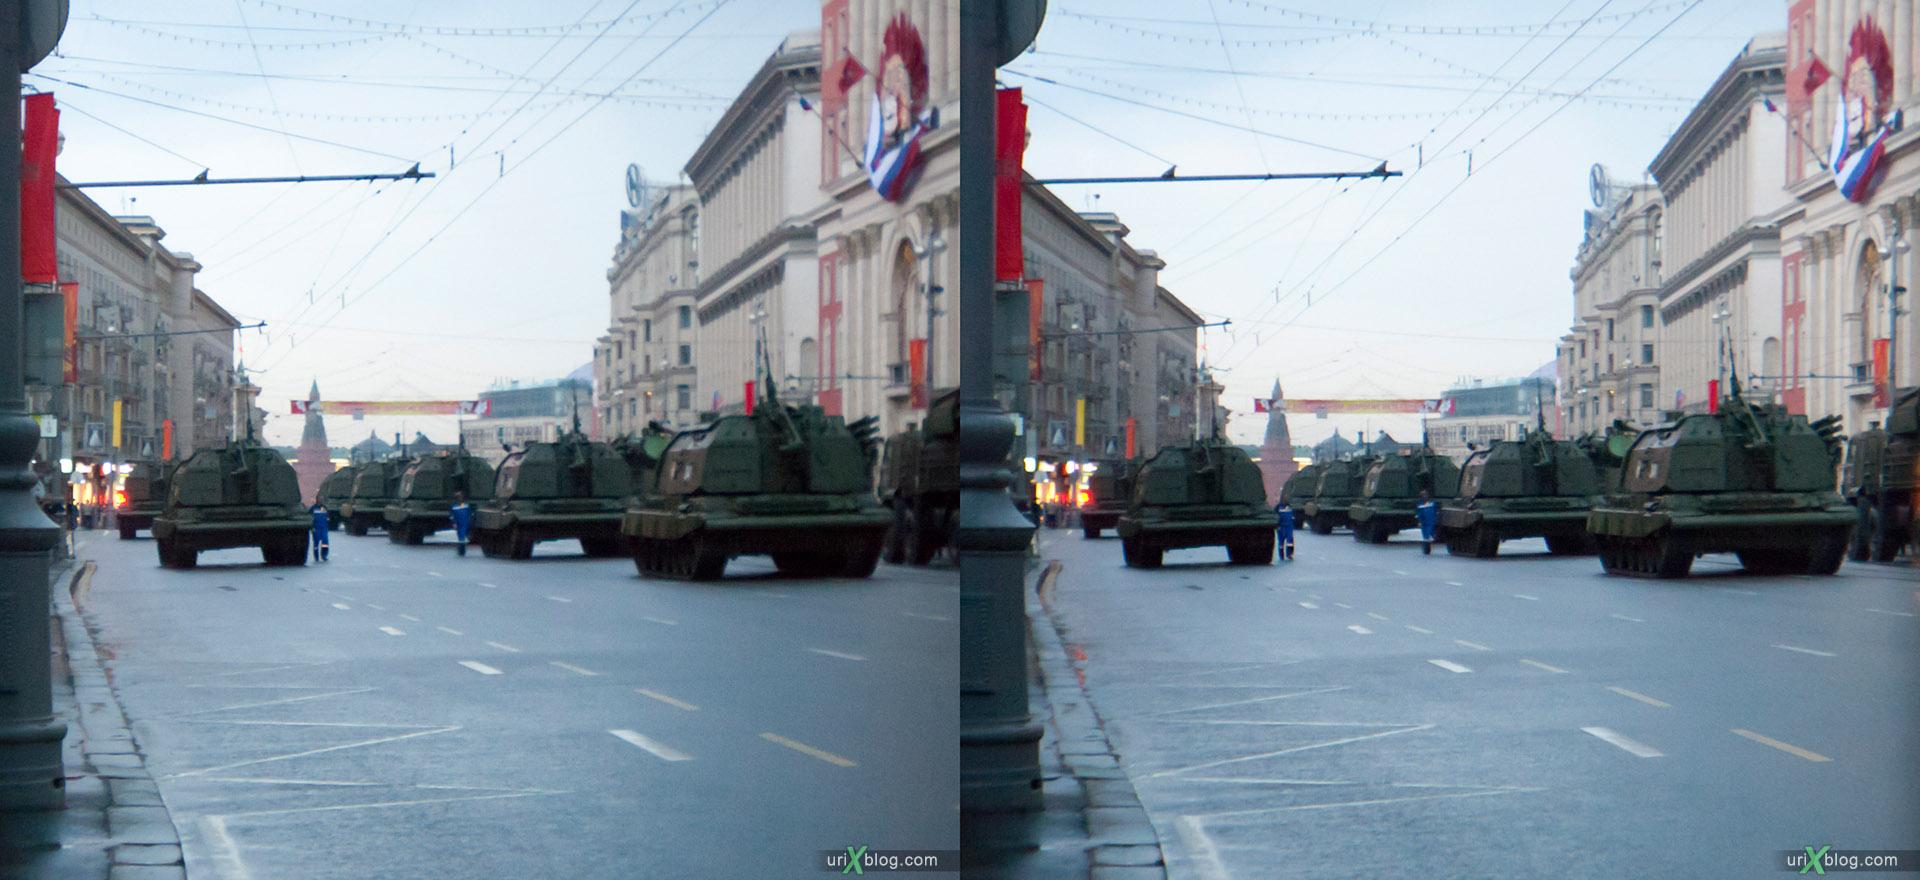 Москва, репетиция парада, Moscow, Rehearsal of the parade вечер 2011 9 мая танк тверская стерео, 3D stereo cross-view стереопара